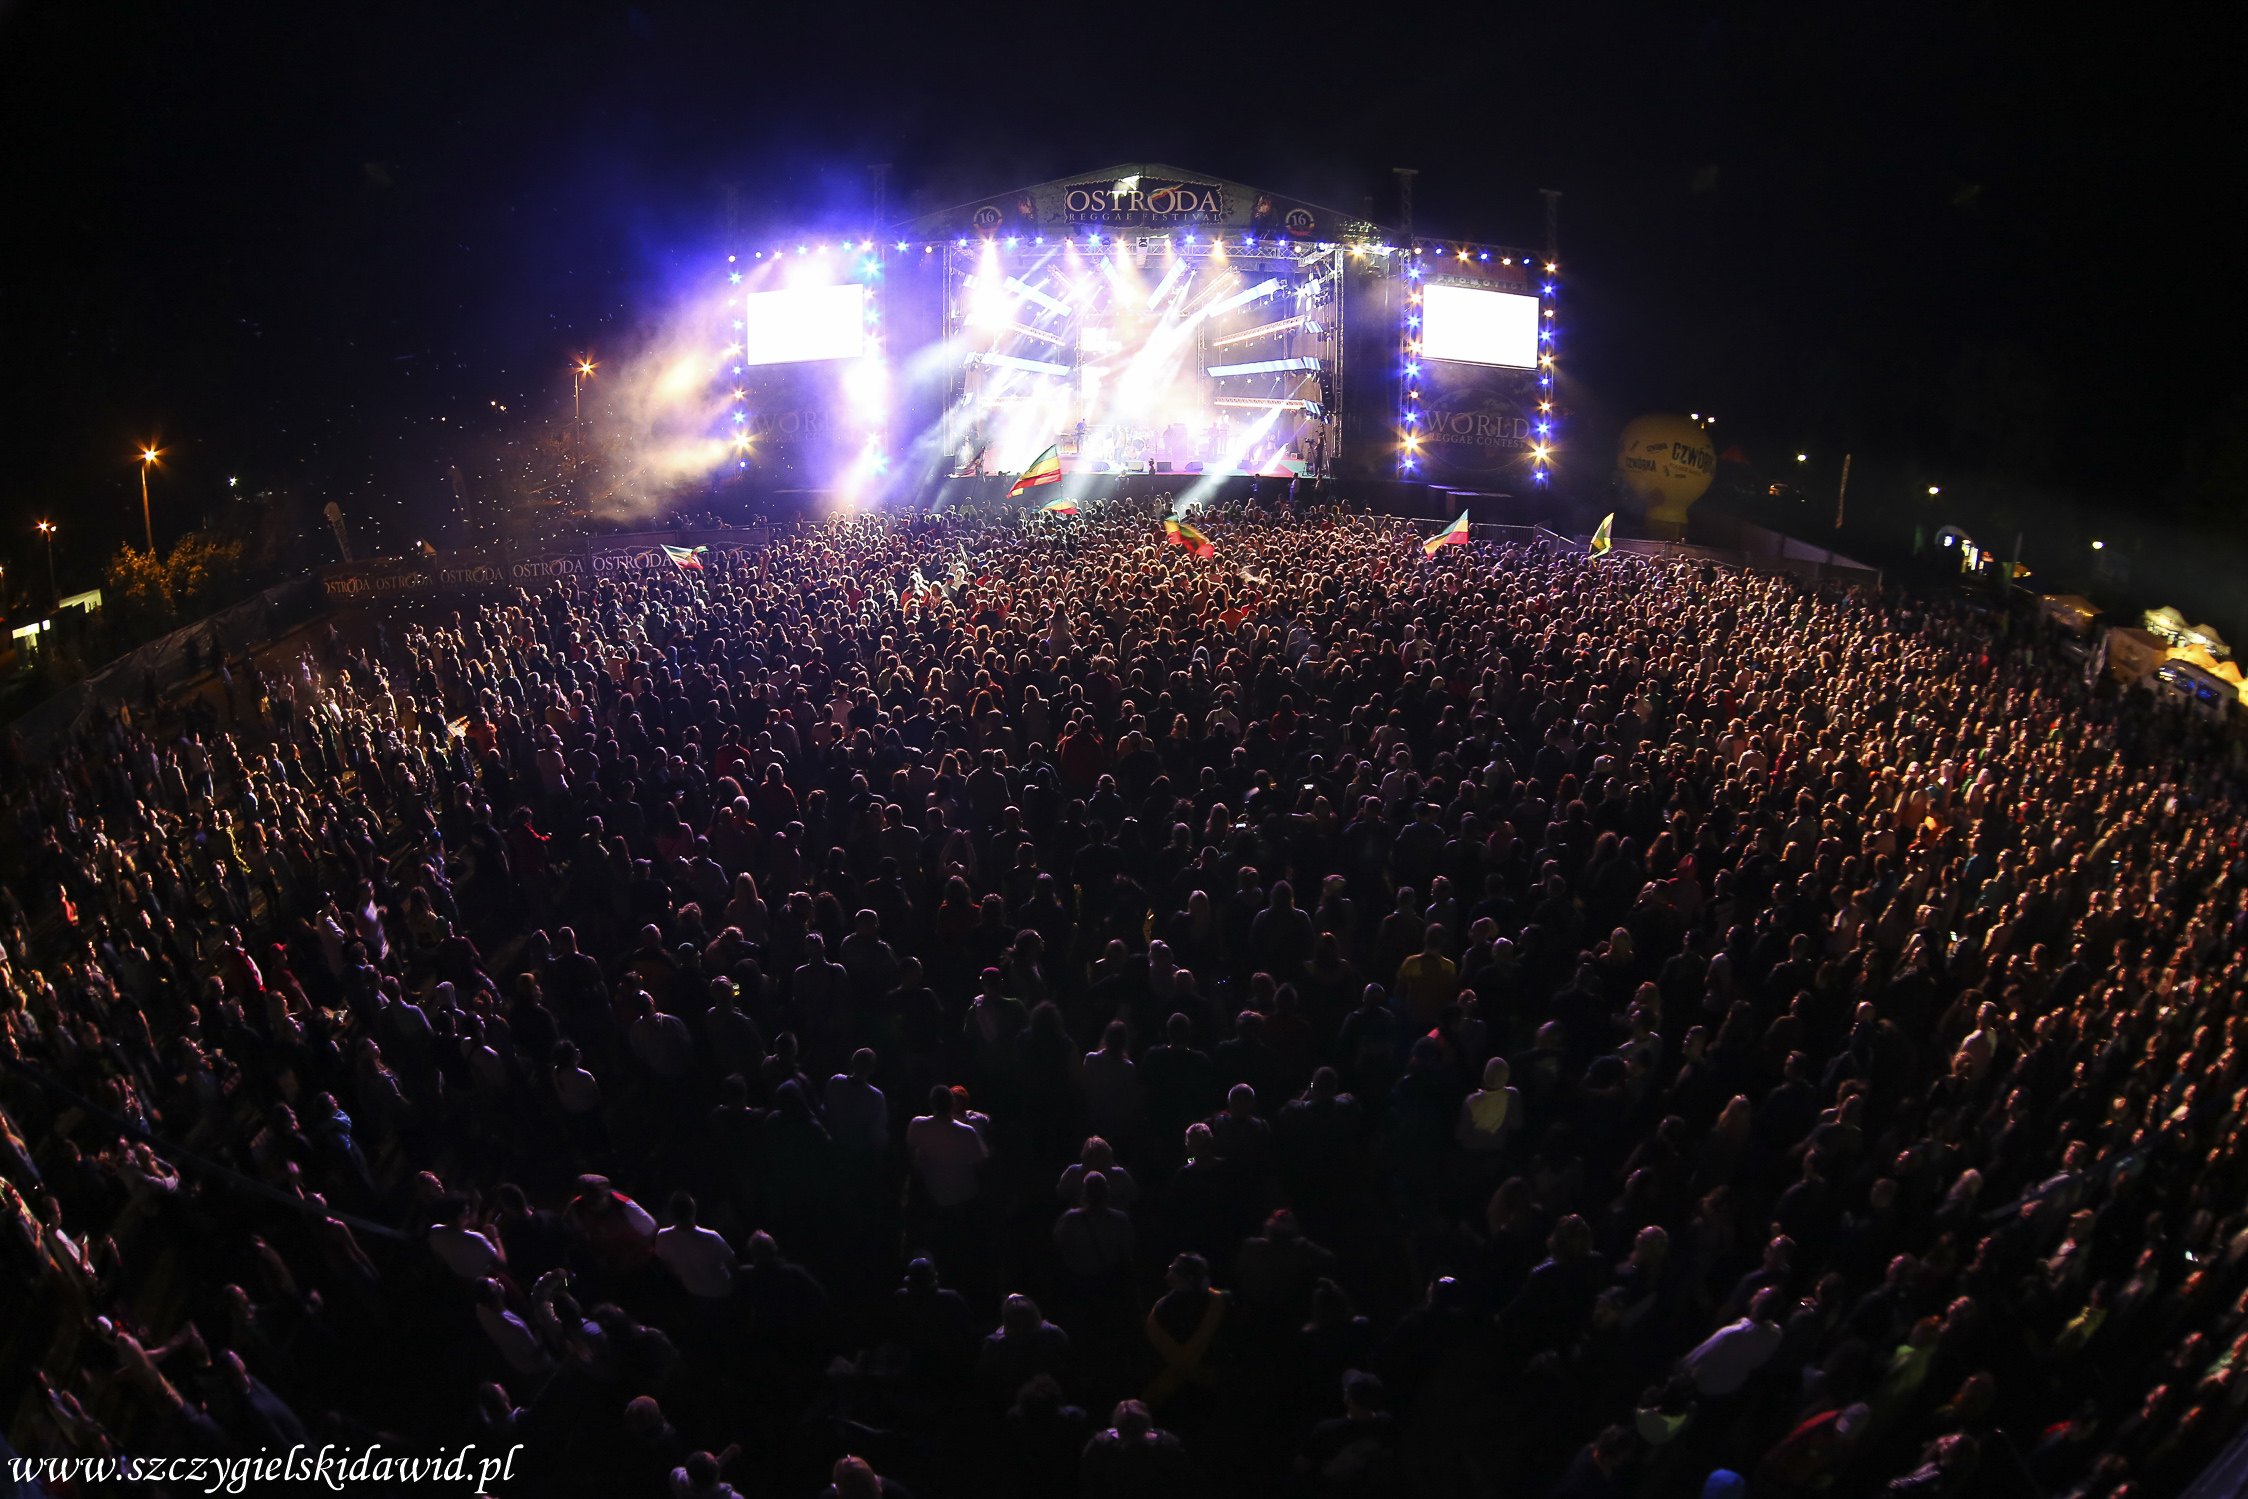 Ostróda Reggae Festival 2016